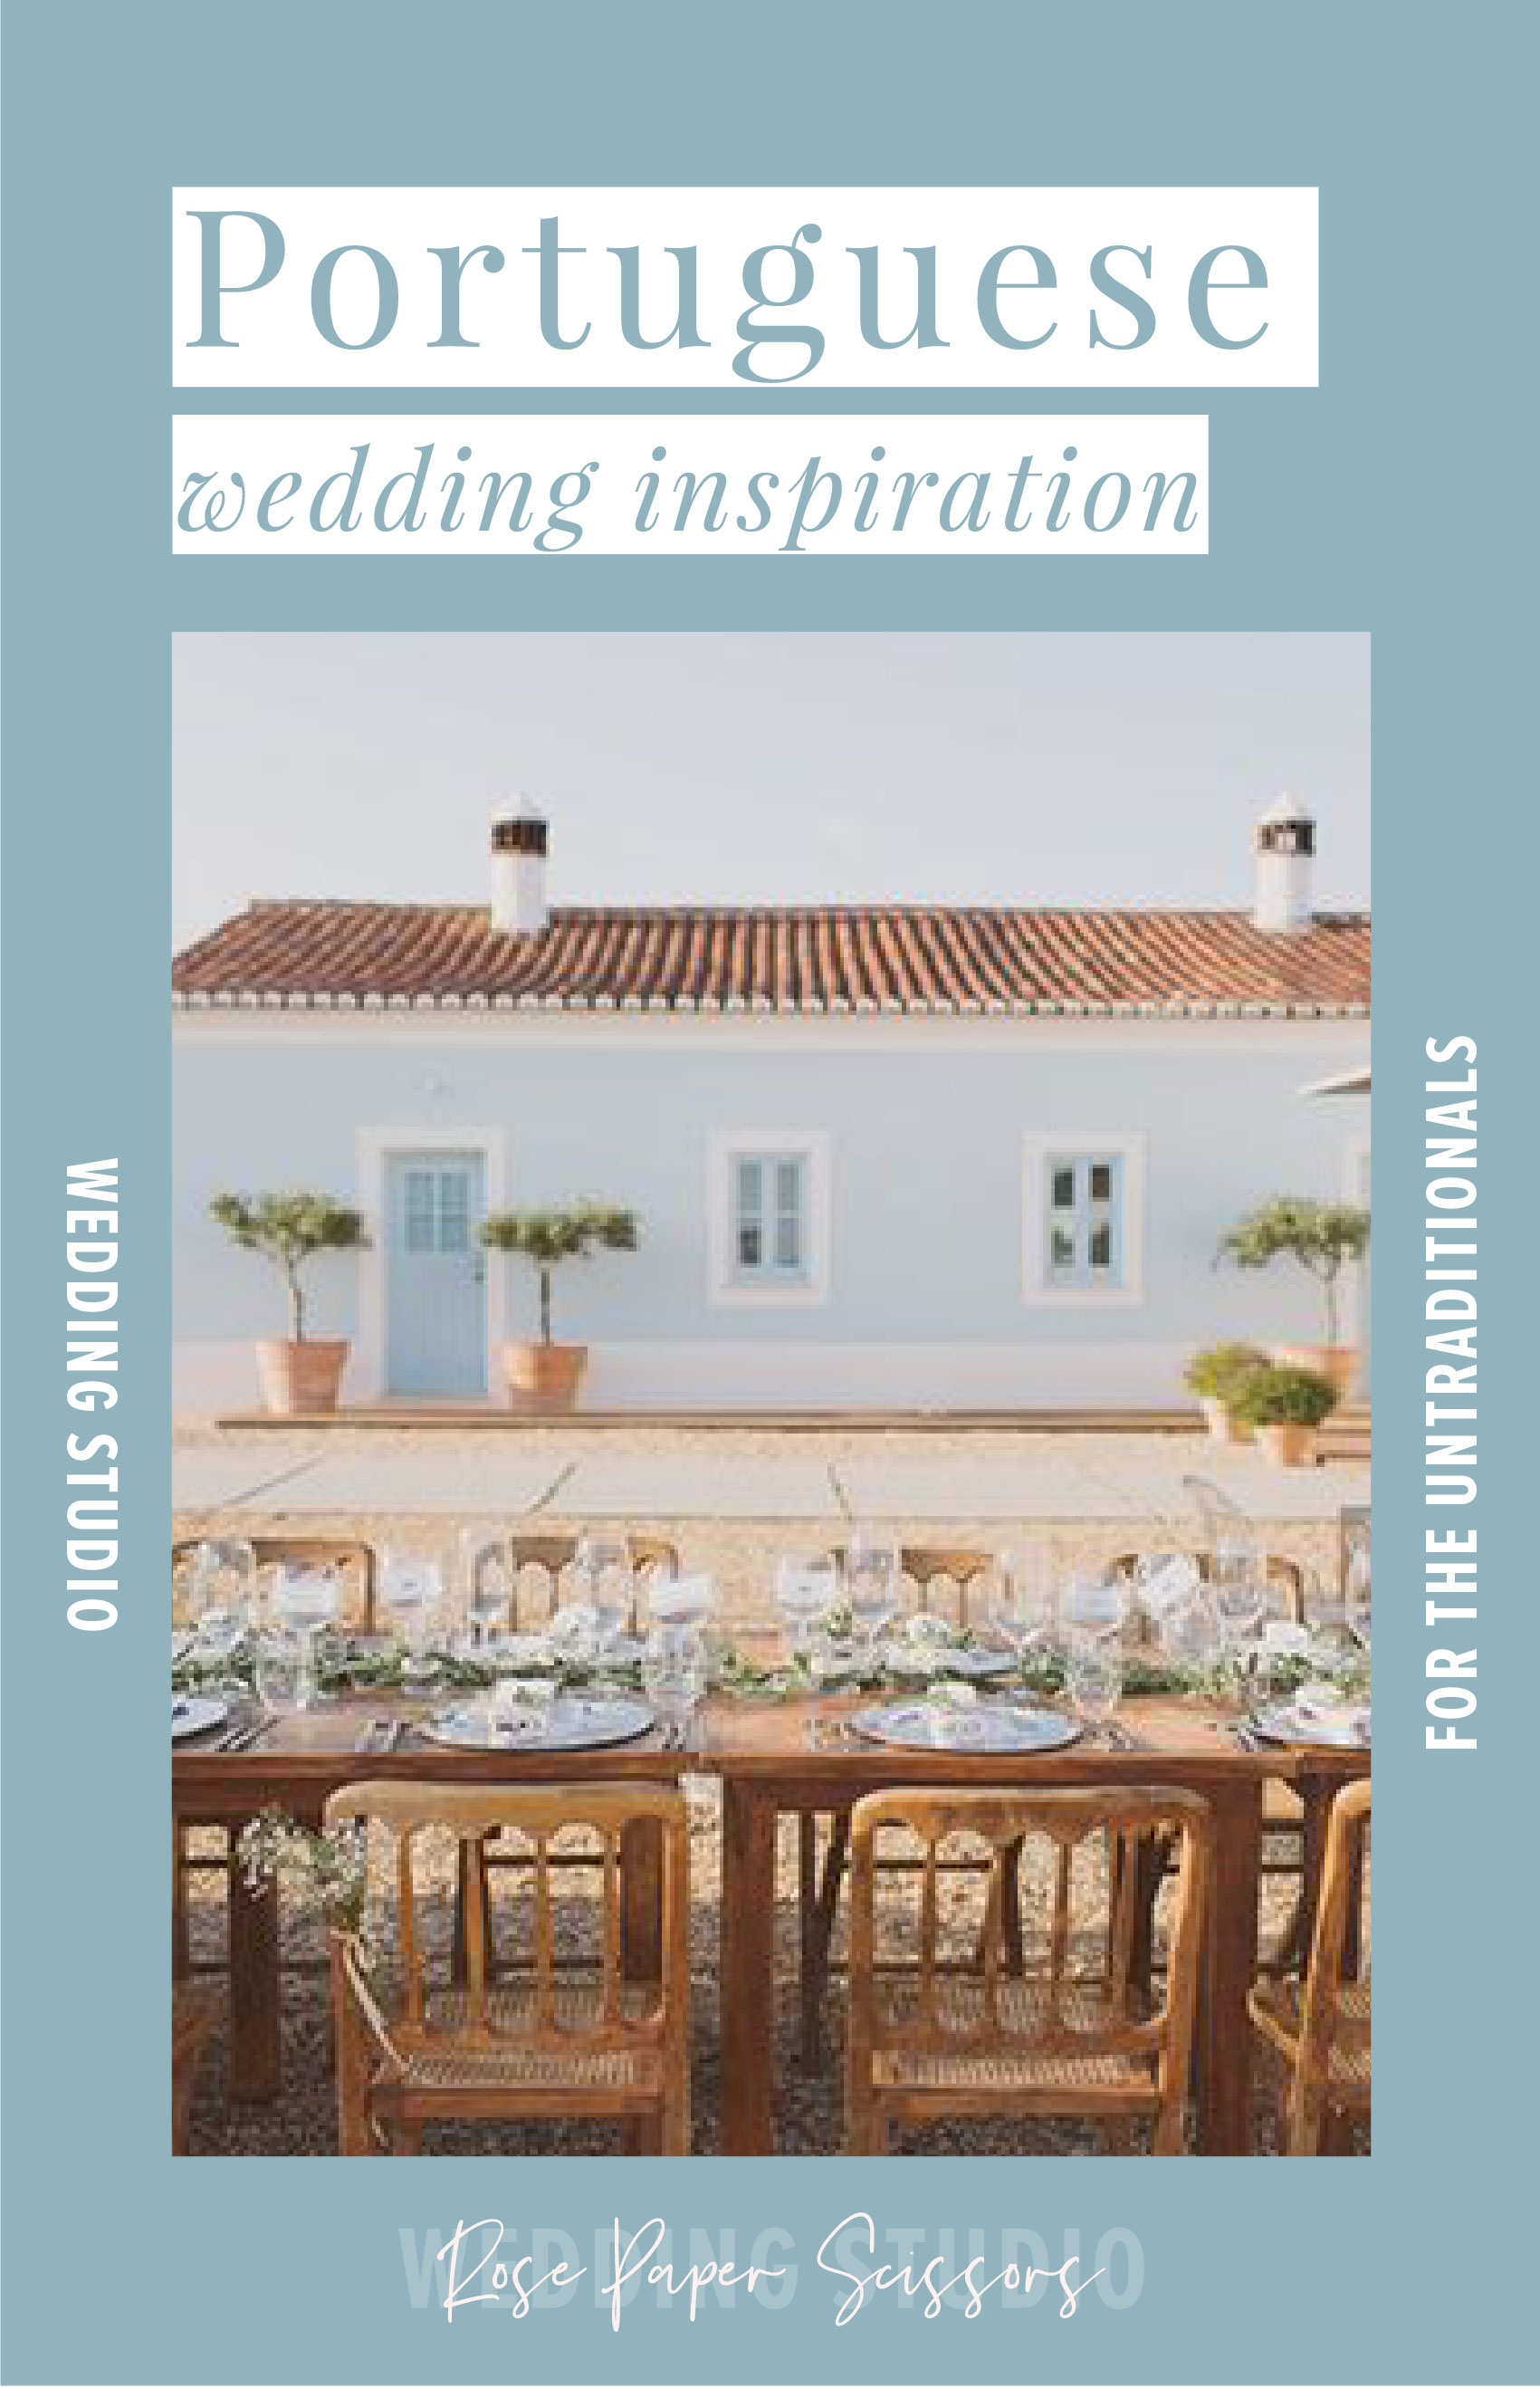 Portuguese wedding inspiration for destination weddings in Portugal